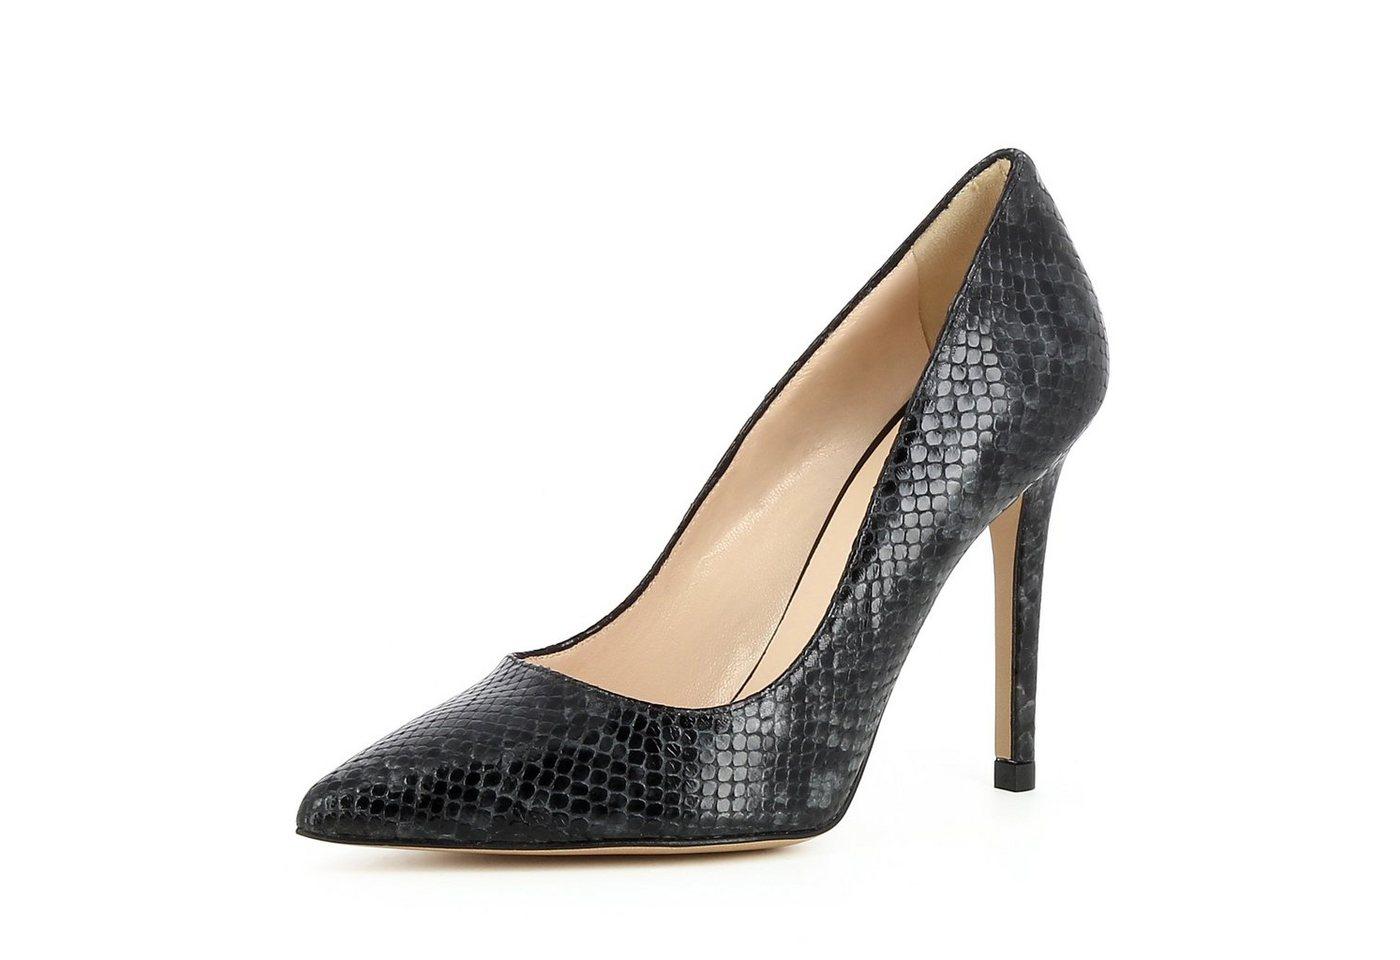 Evita »ALINA« High-Heel-Pumps | Schuhe > High Heels > High Heel Pumps | Grau | Leder | Evita